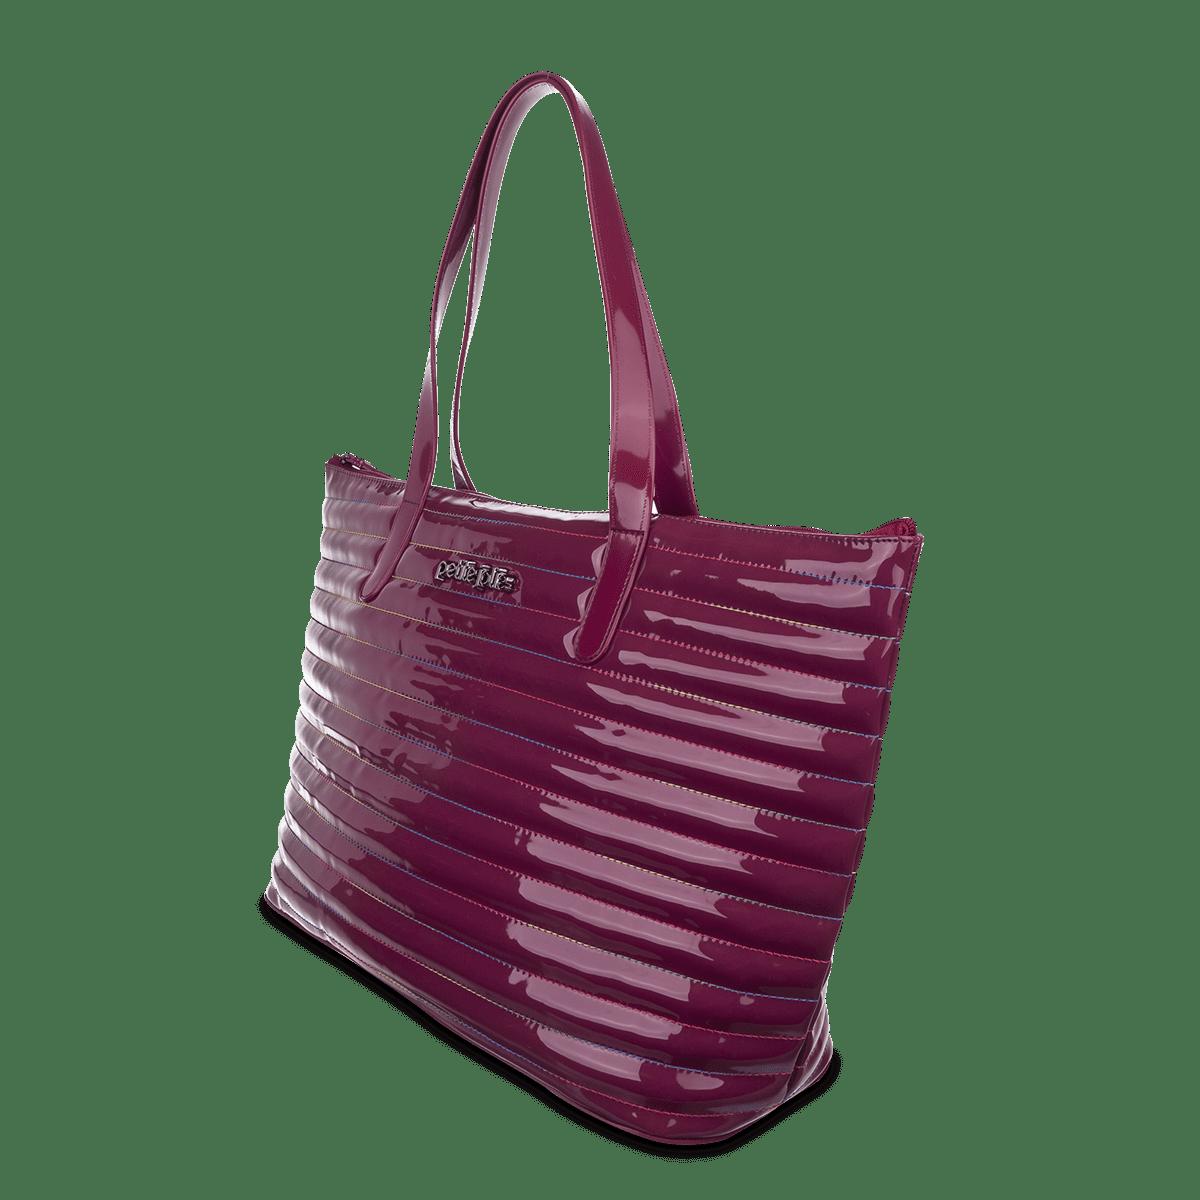 Bolsa Petite Jolie Keeper Sacola Metalassê PJ4093  - Prime Bolsas